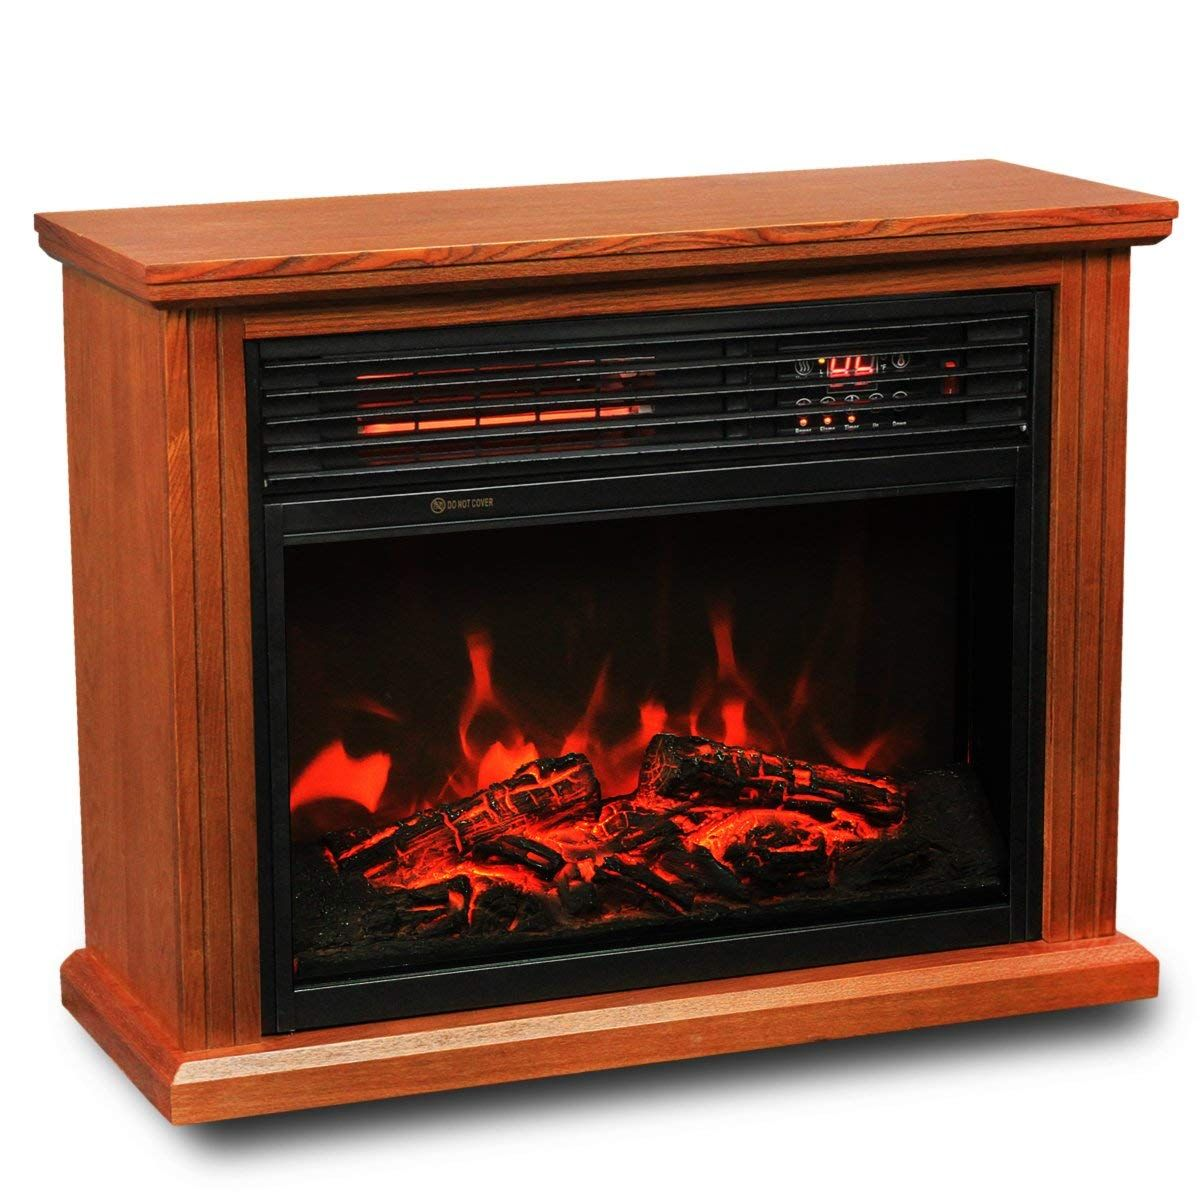 Outstanding Xtremepowerus Infrared Quartz Electric Fireplace Heater Interior Design Ideas Inesswwsoteloinfo